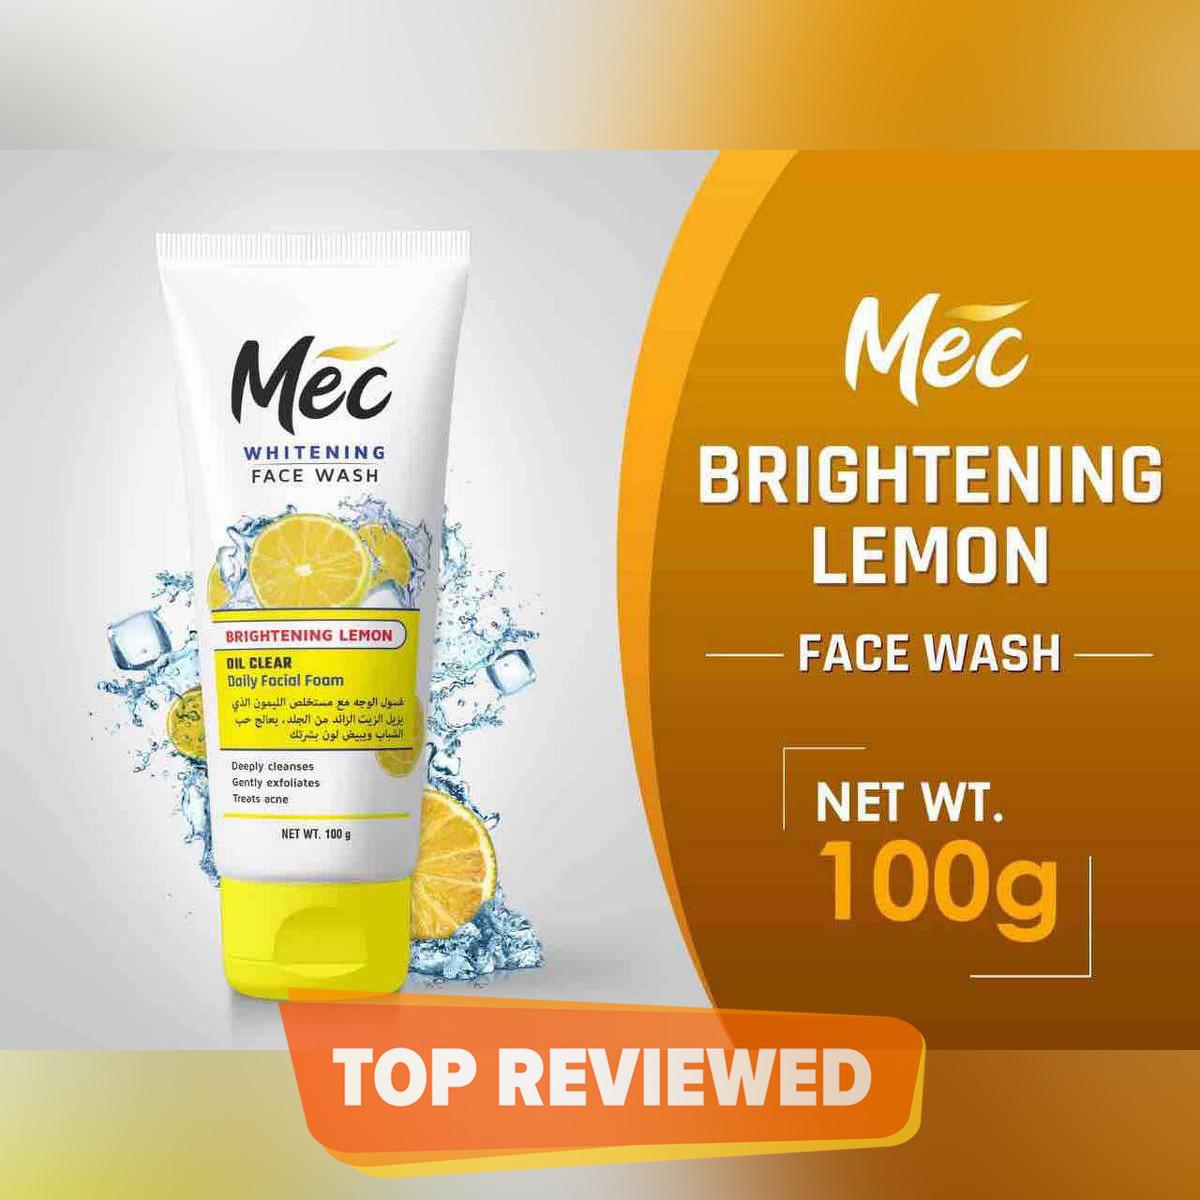 Mec Whitening Oil Clean Face Wash